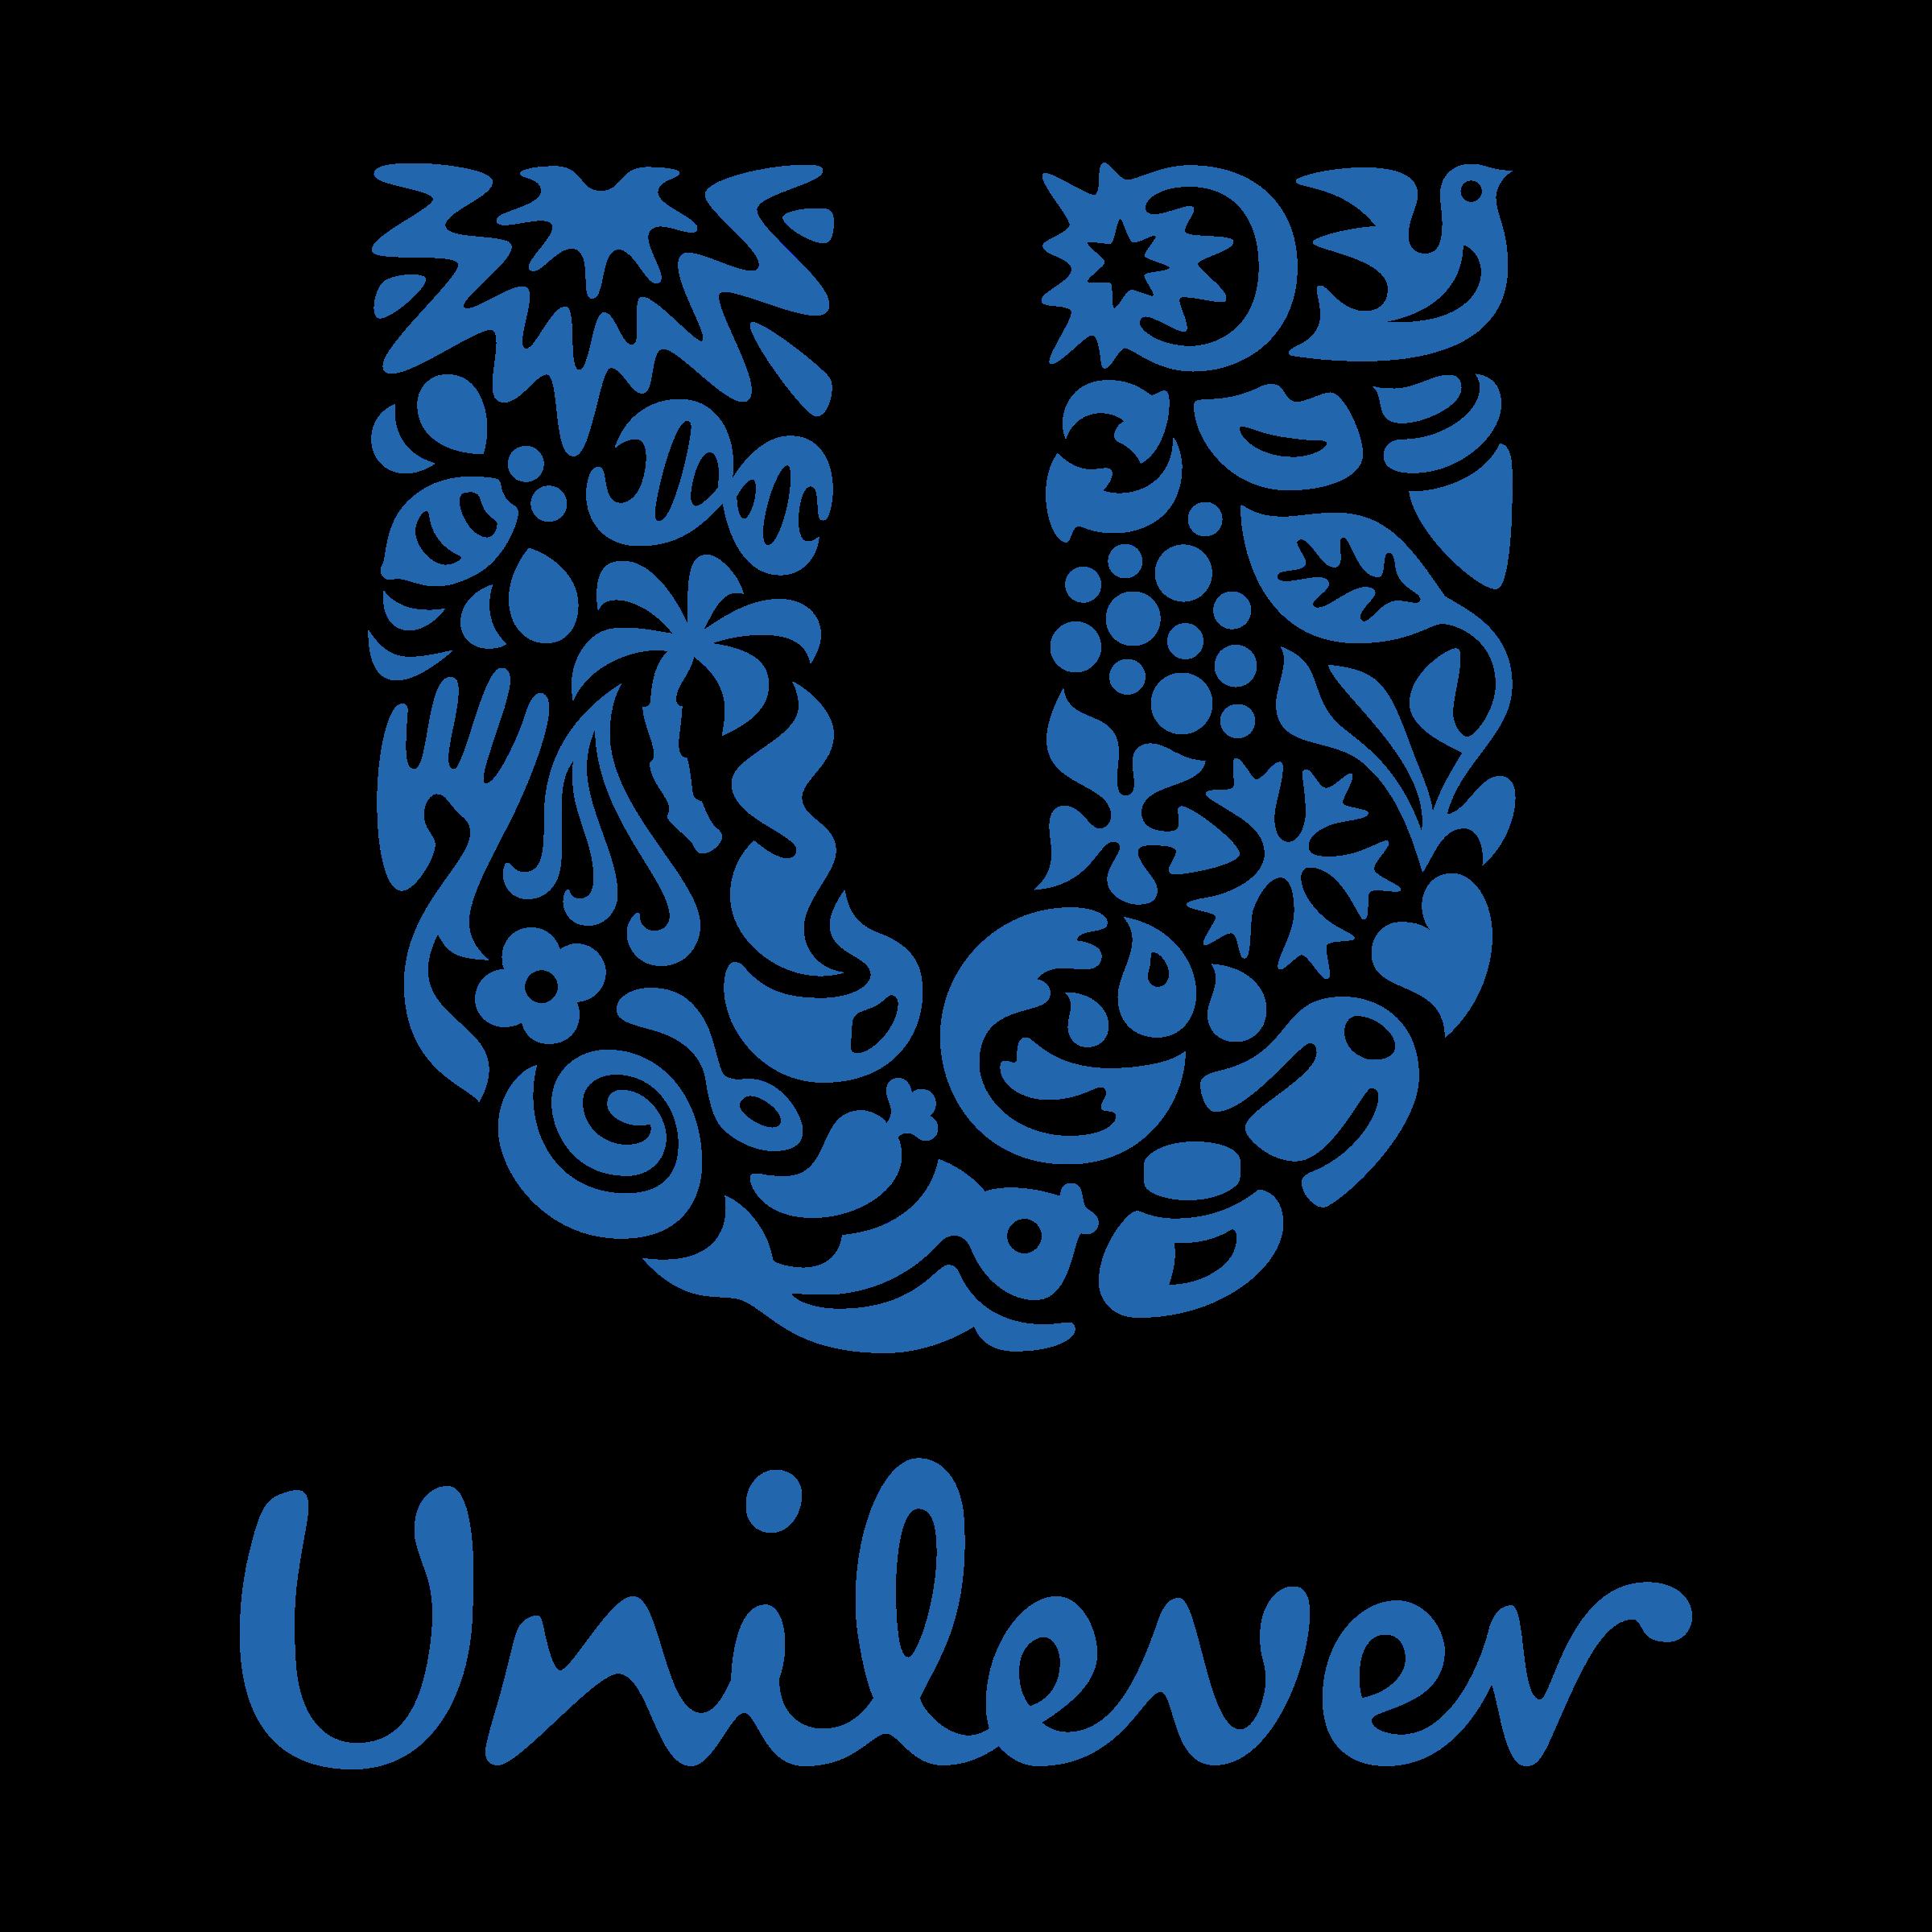 unilever-2-logo-png-transparent